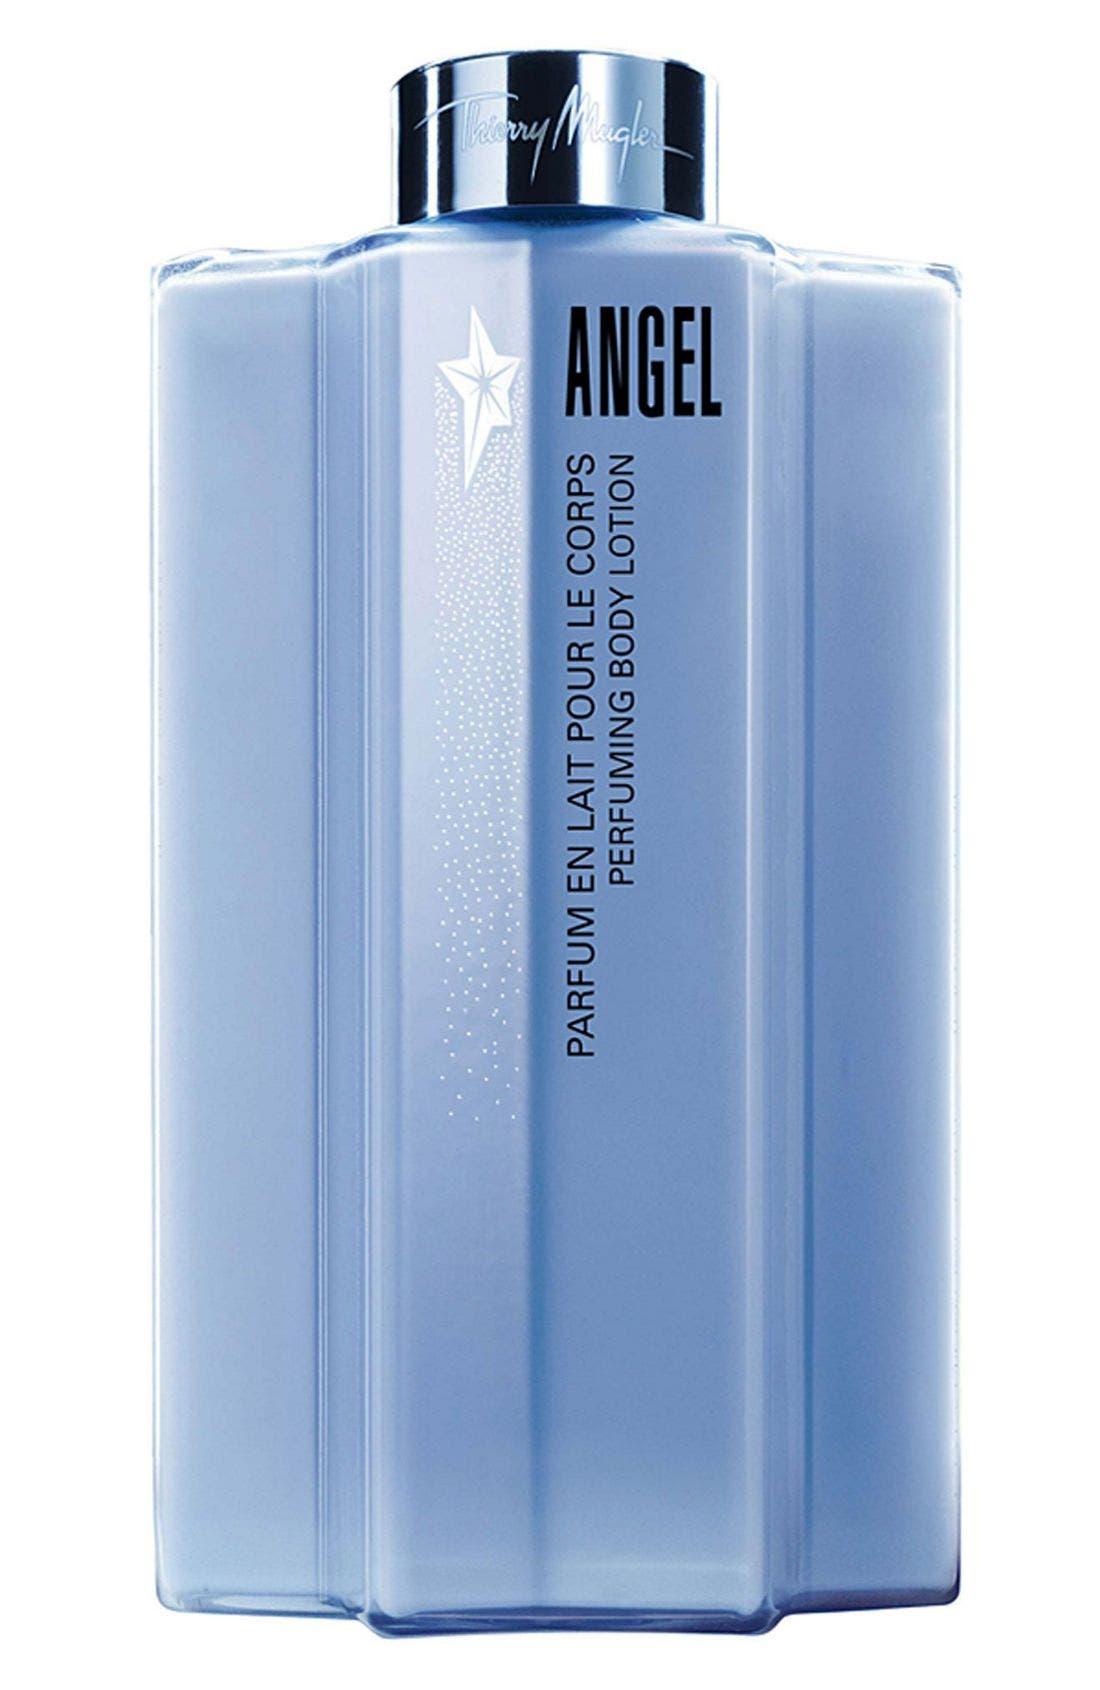 Angel by Mugler Perfuming Body Lotion